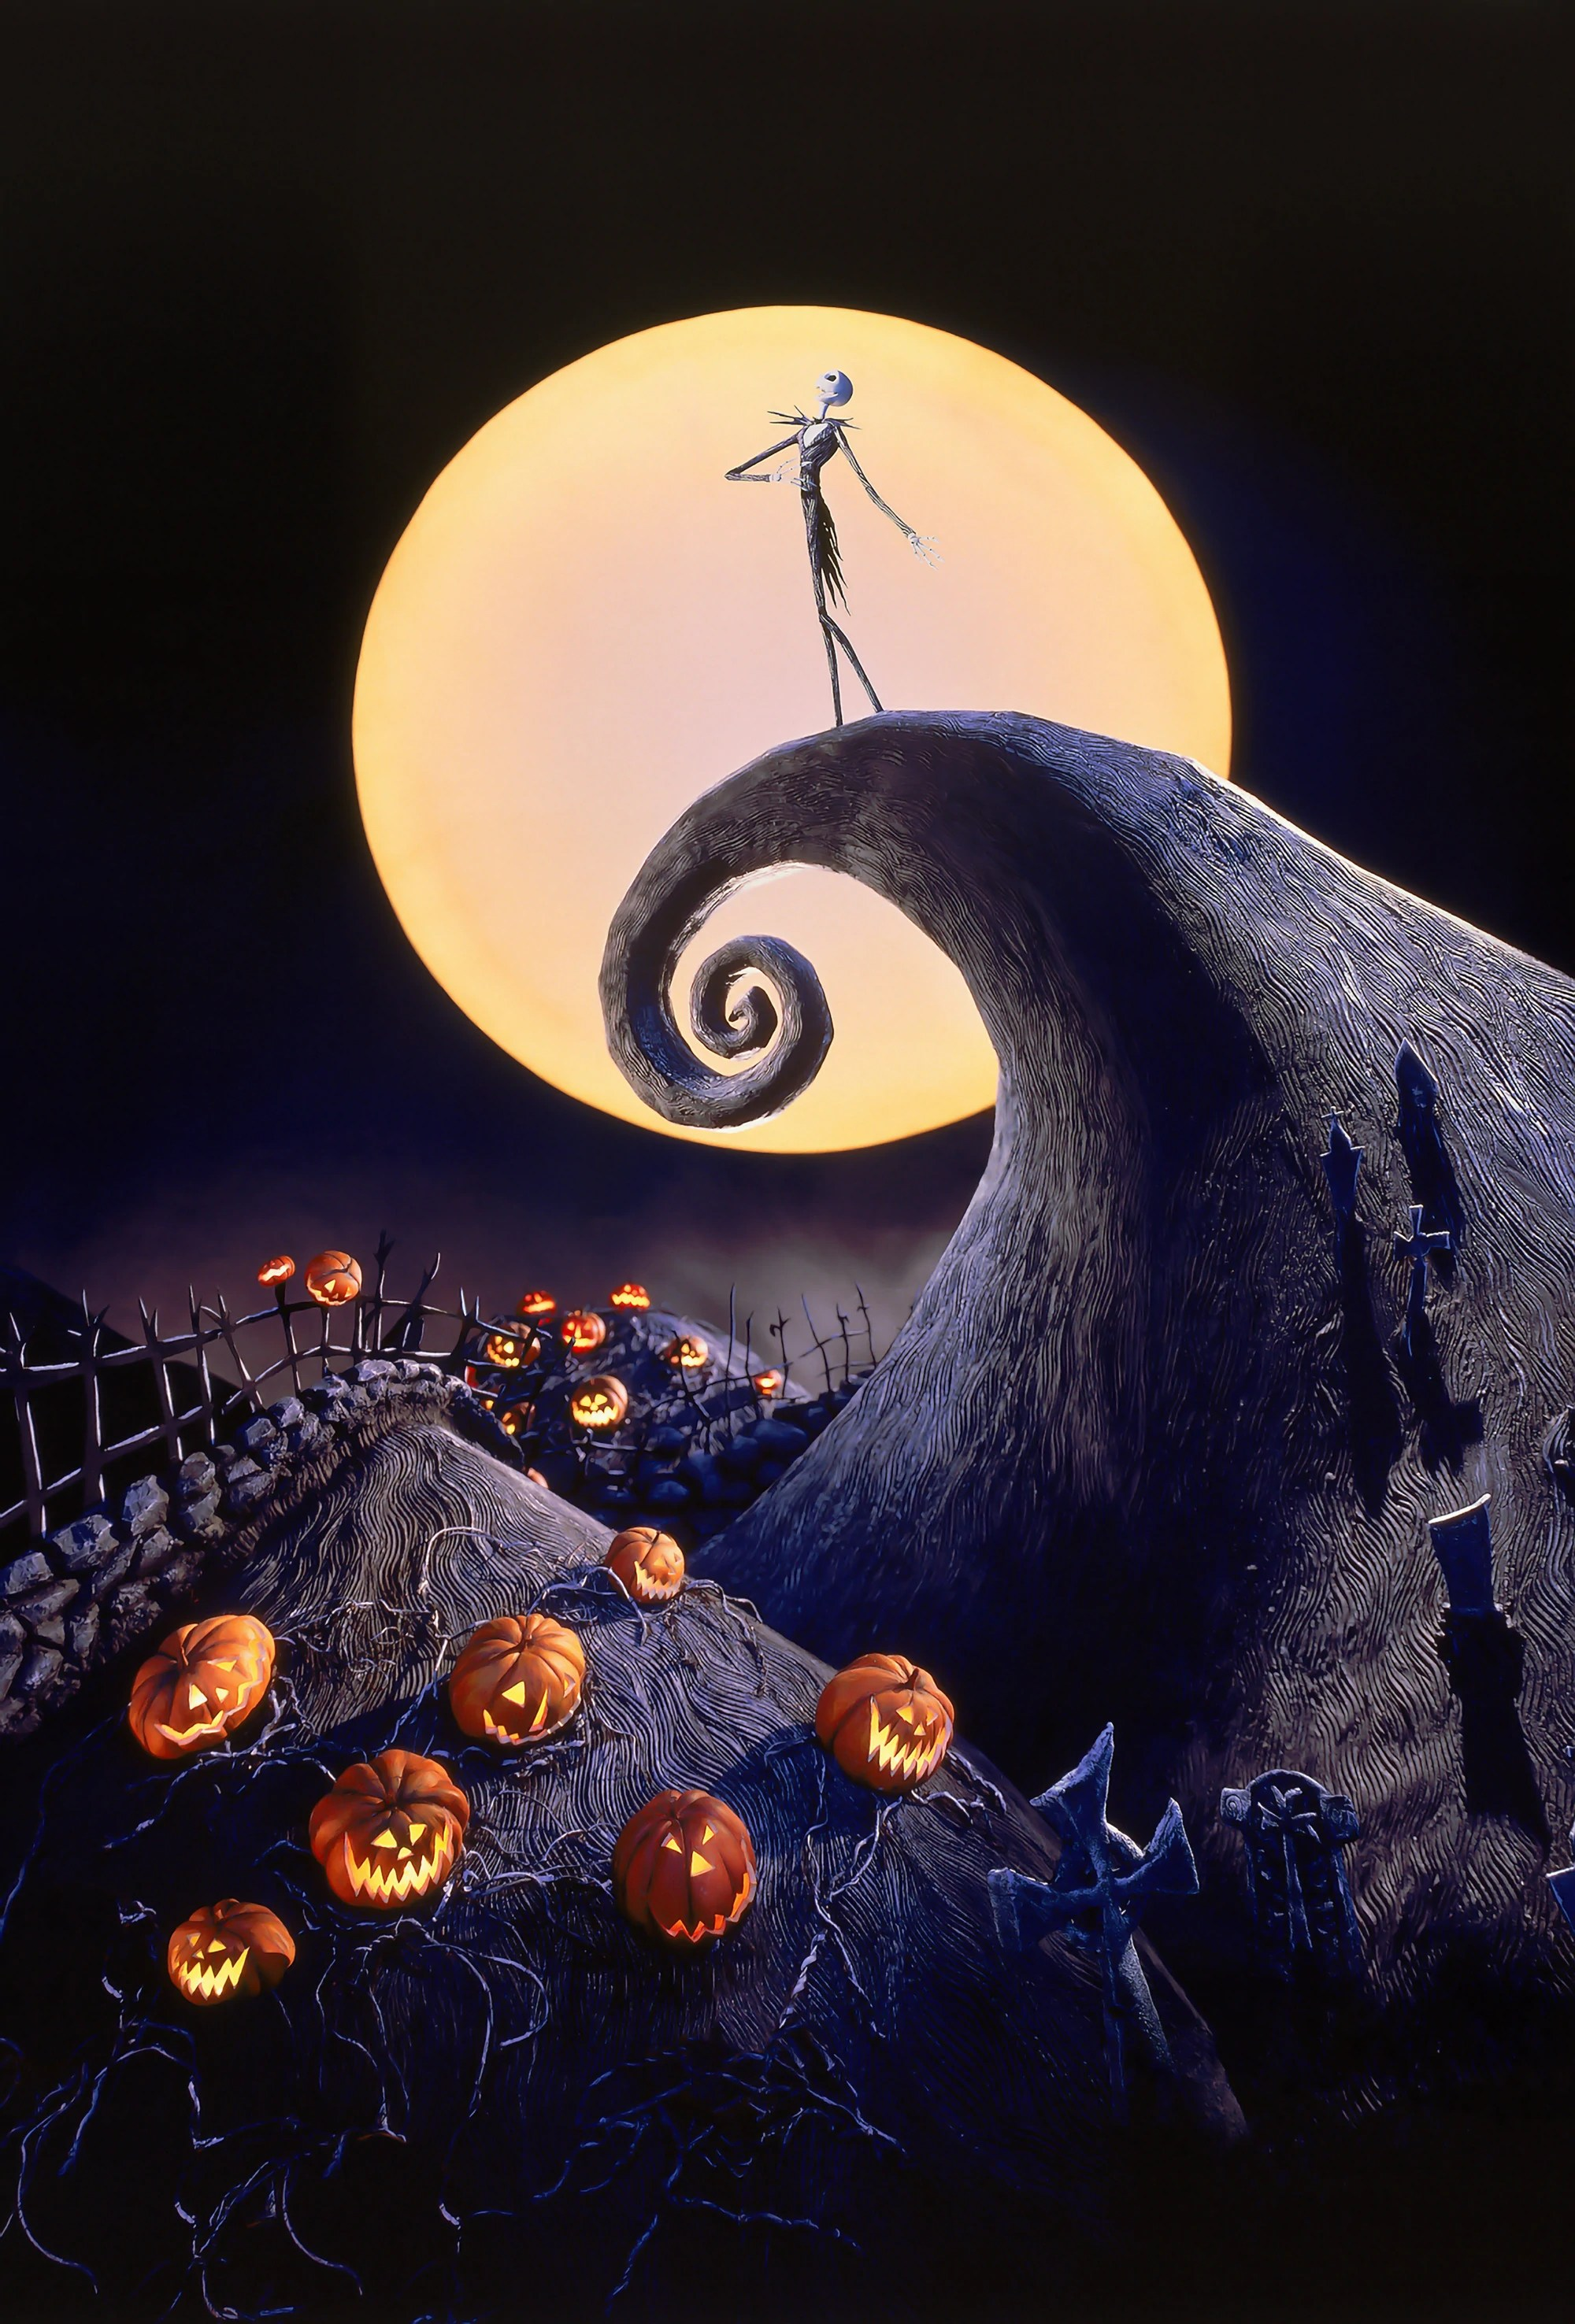 The Nightmare Before Christmas | Disney Wiki | Fandom powered by Wikia